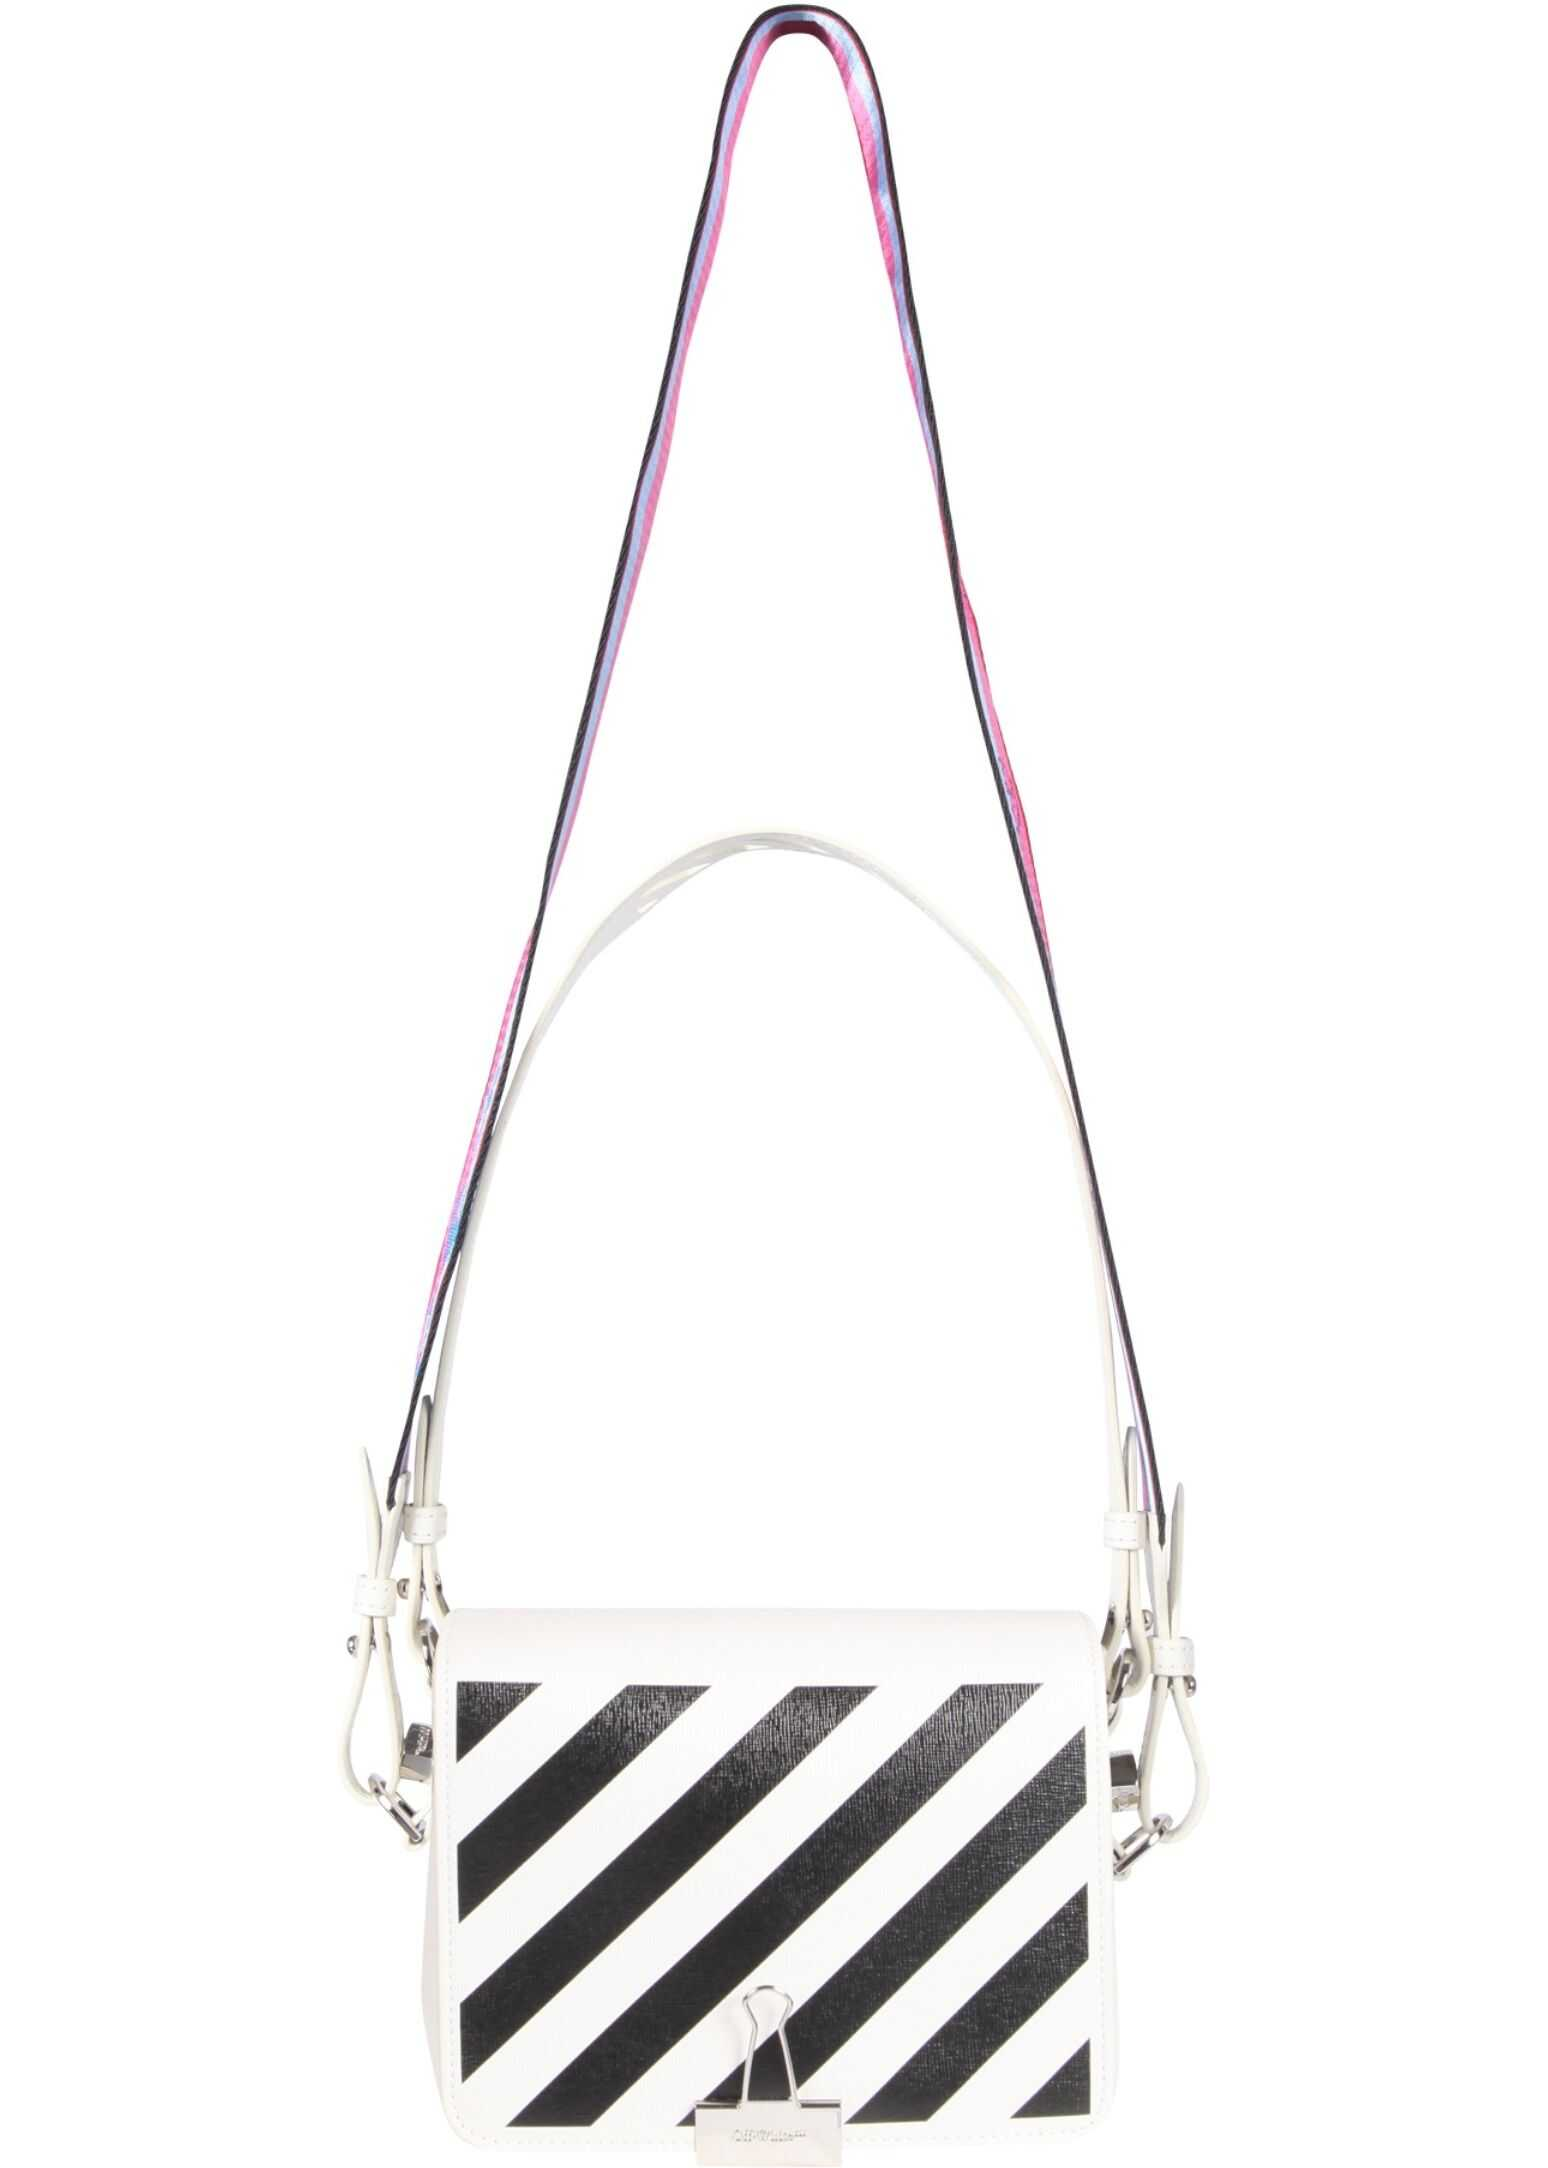 Off-White Bag With Diagonal Stripes Print OWNN018_S21LEA0010110 WHITE imagine b-mall.ro